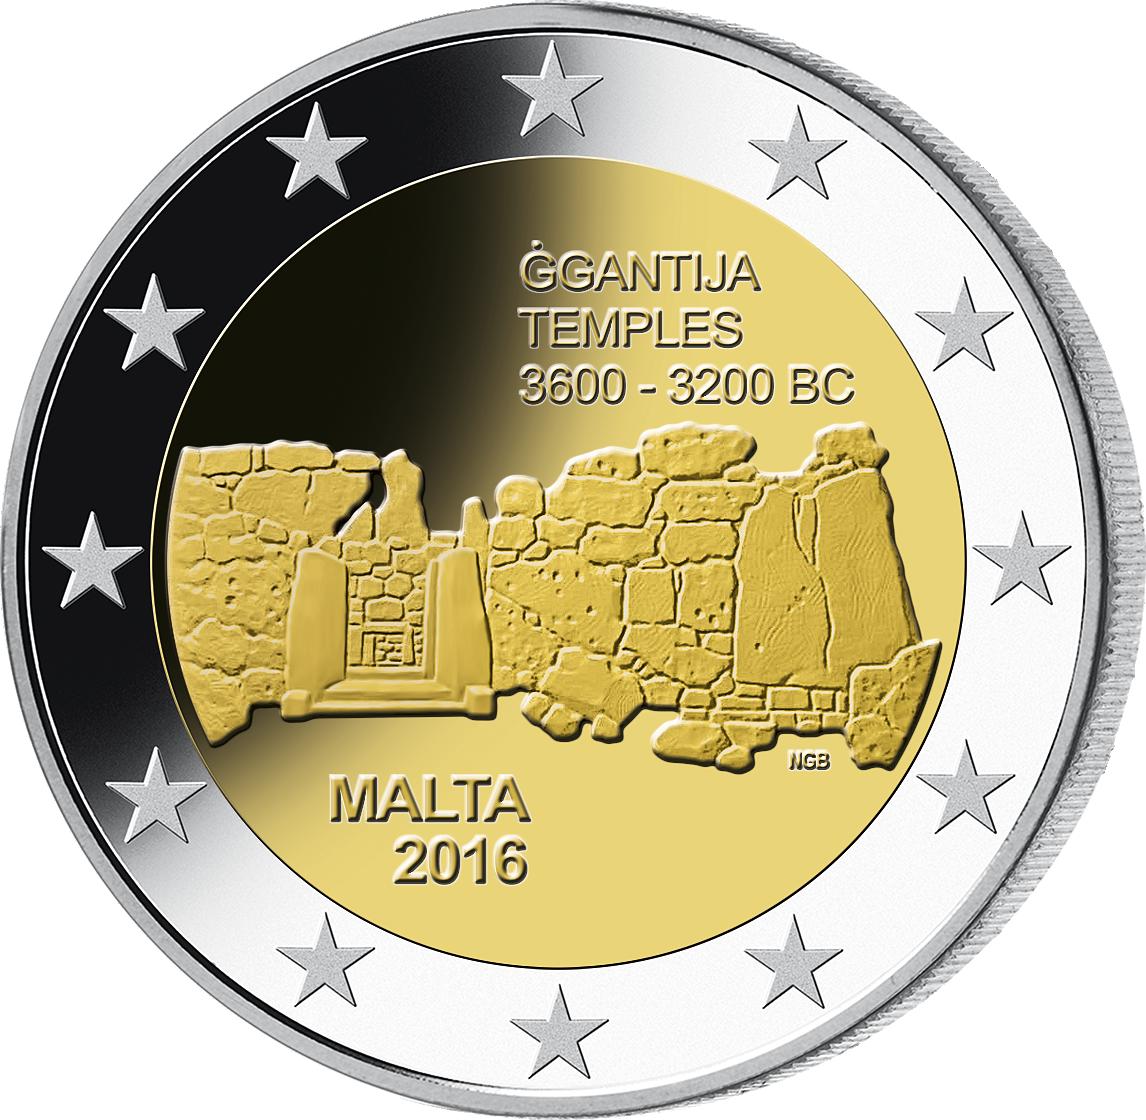 2 Euro Münze Malta Gantija 2016 Bfr Münzen Günstigerde